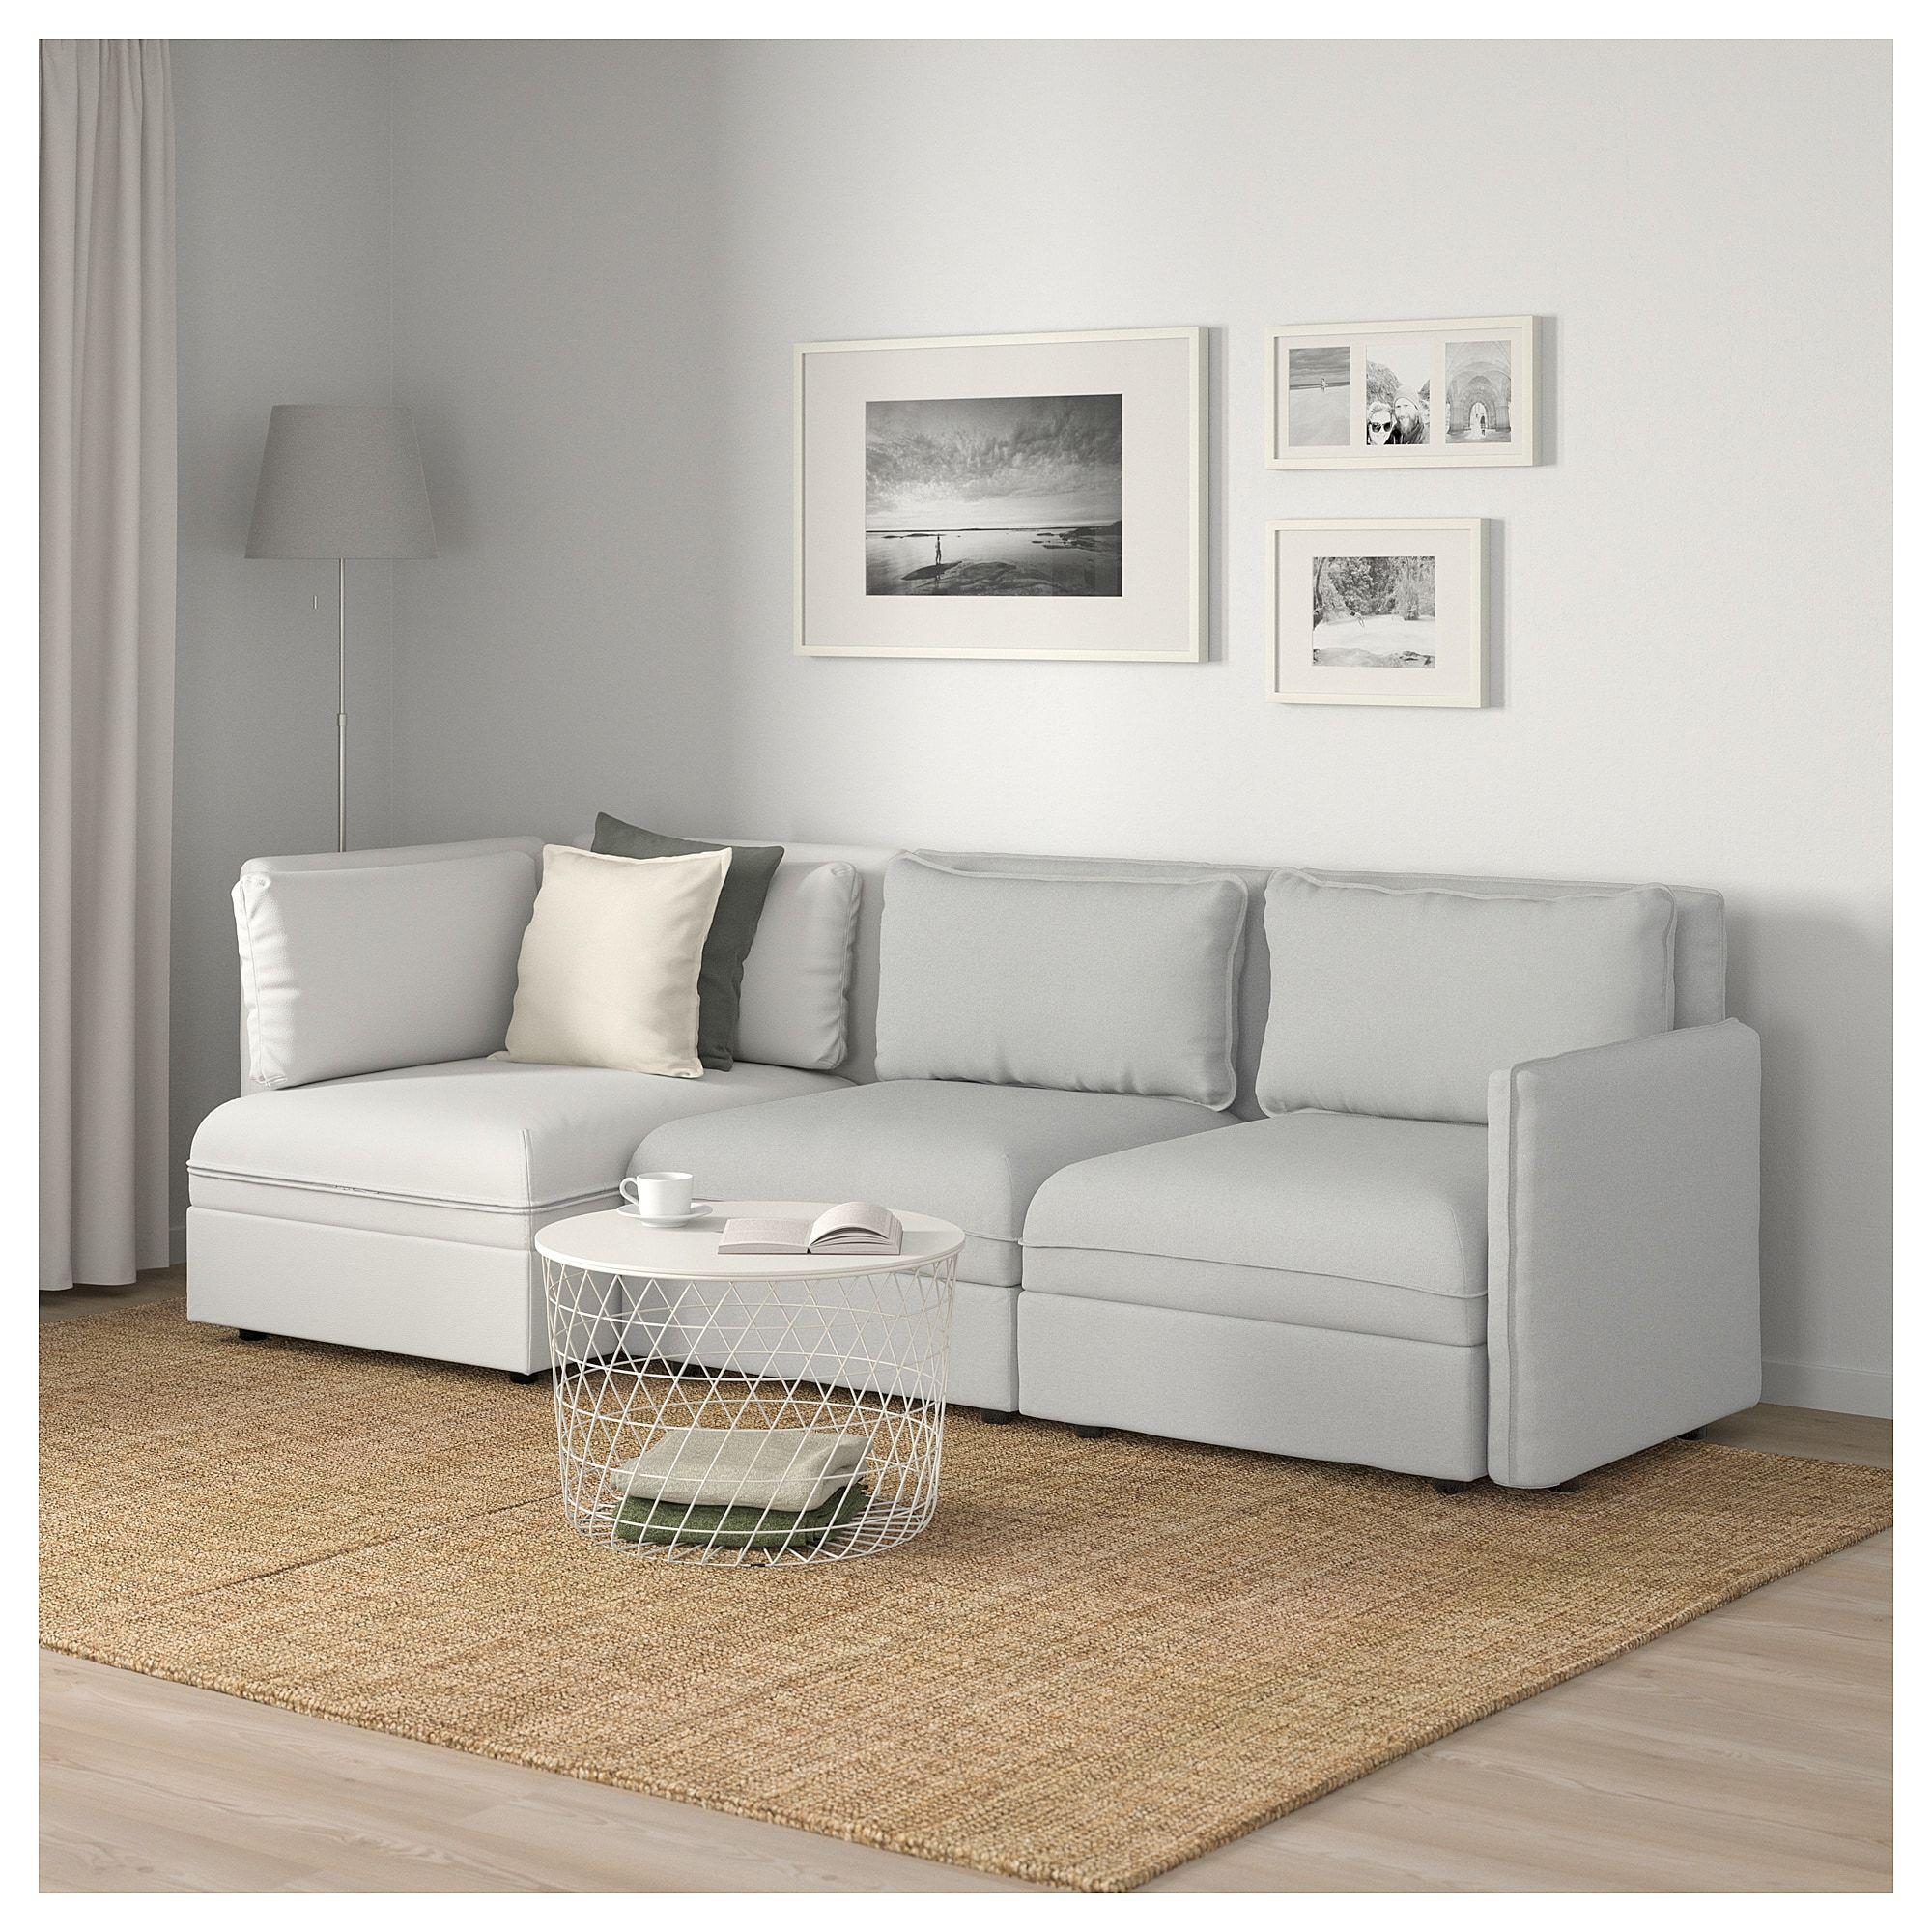 Us Furniture And Home Furnishings Modular Sofa Sleeper Sofa Sofa